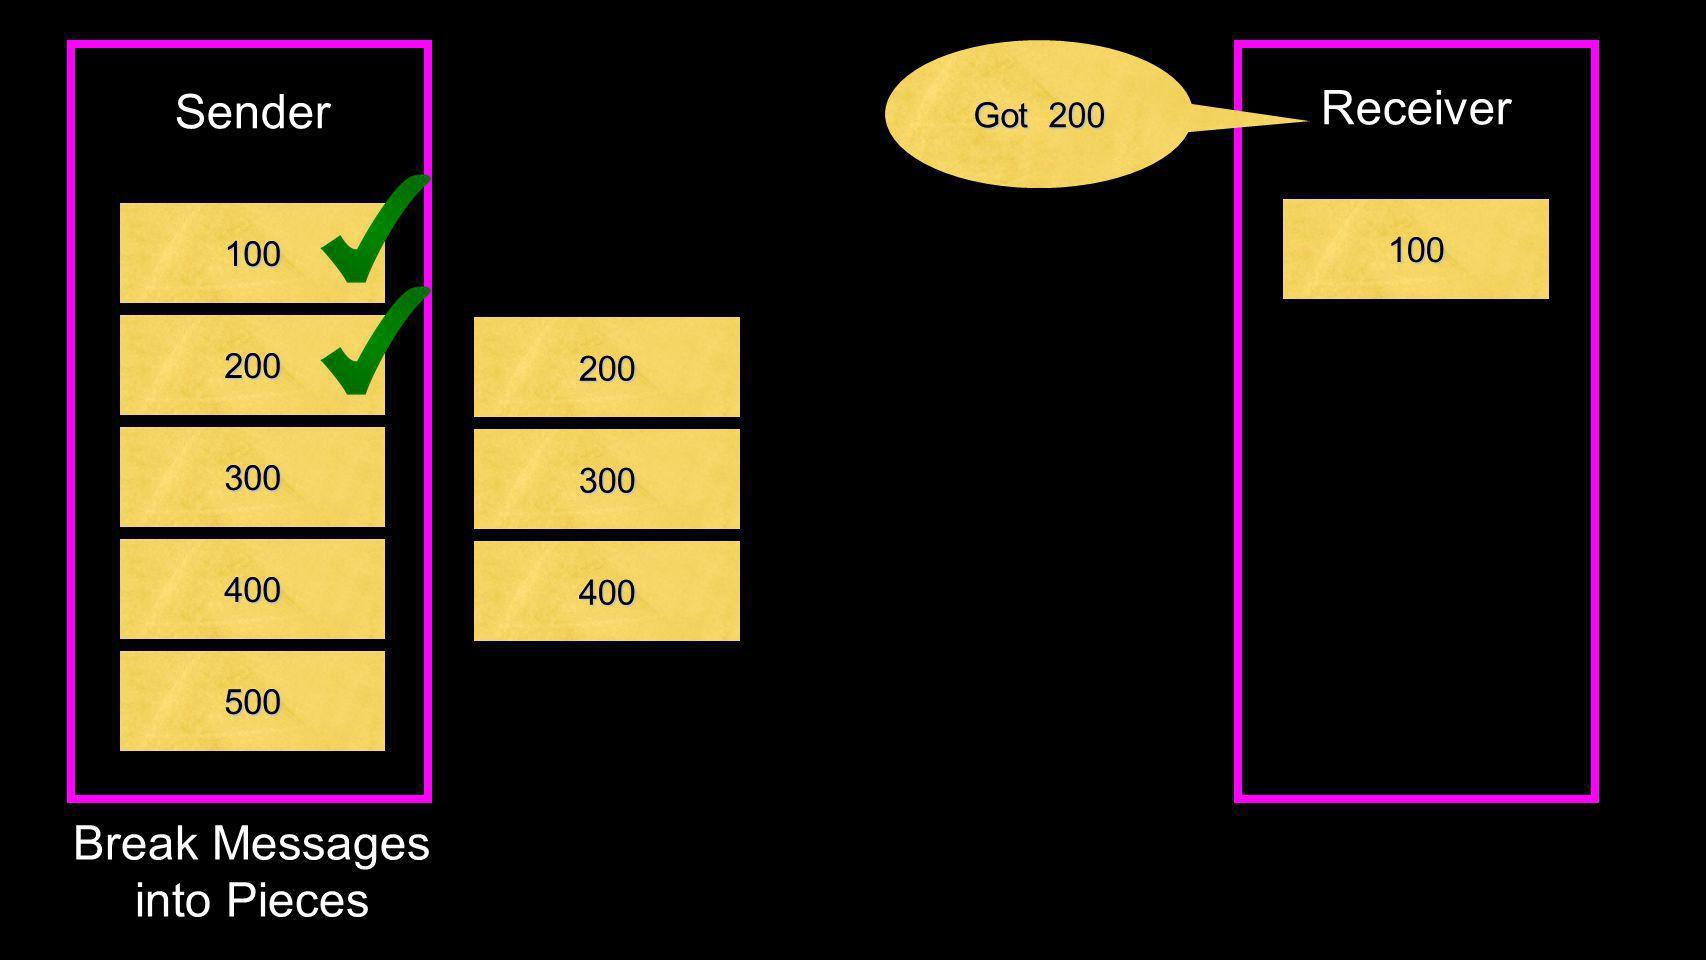 100 200 300 400 500 Break Messages into Pieces Sender 100 Receiver 200 300 Got 200 400